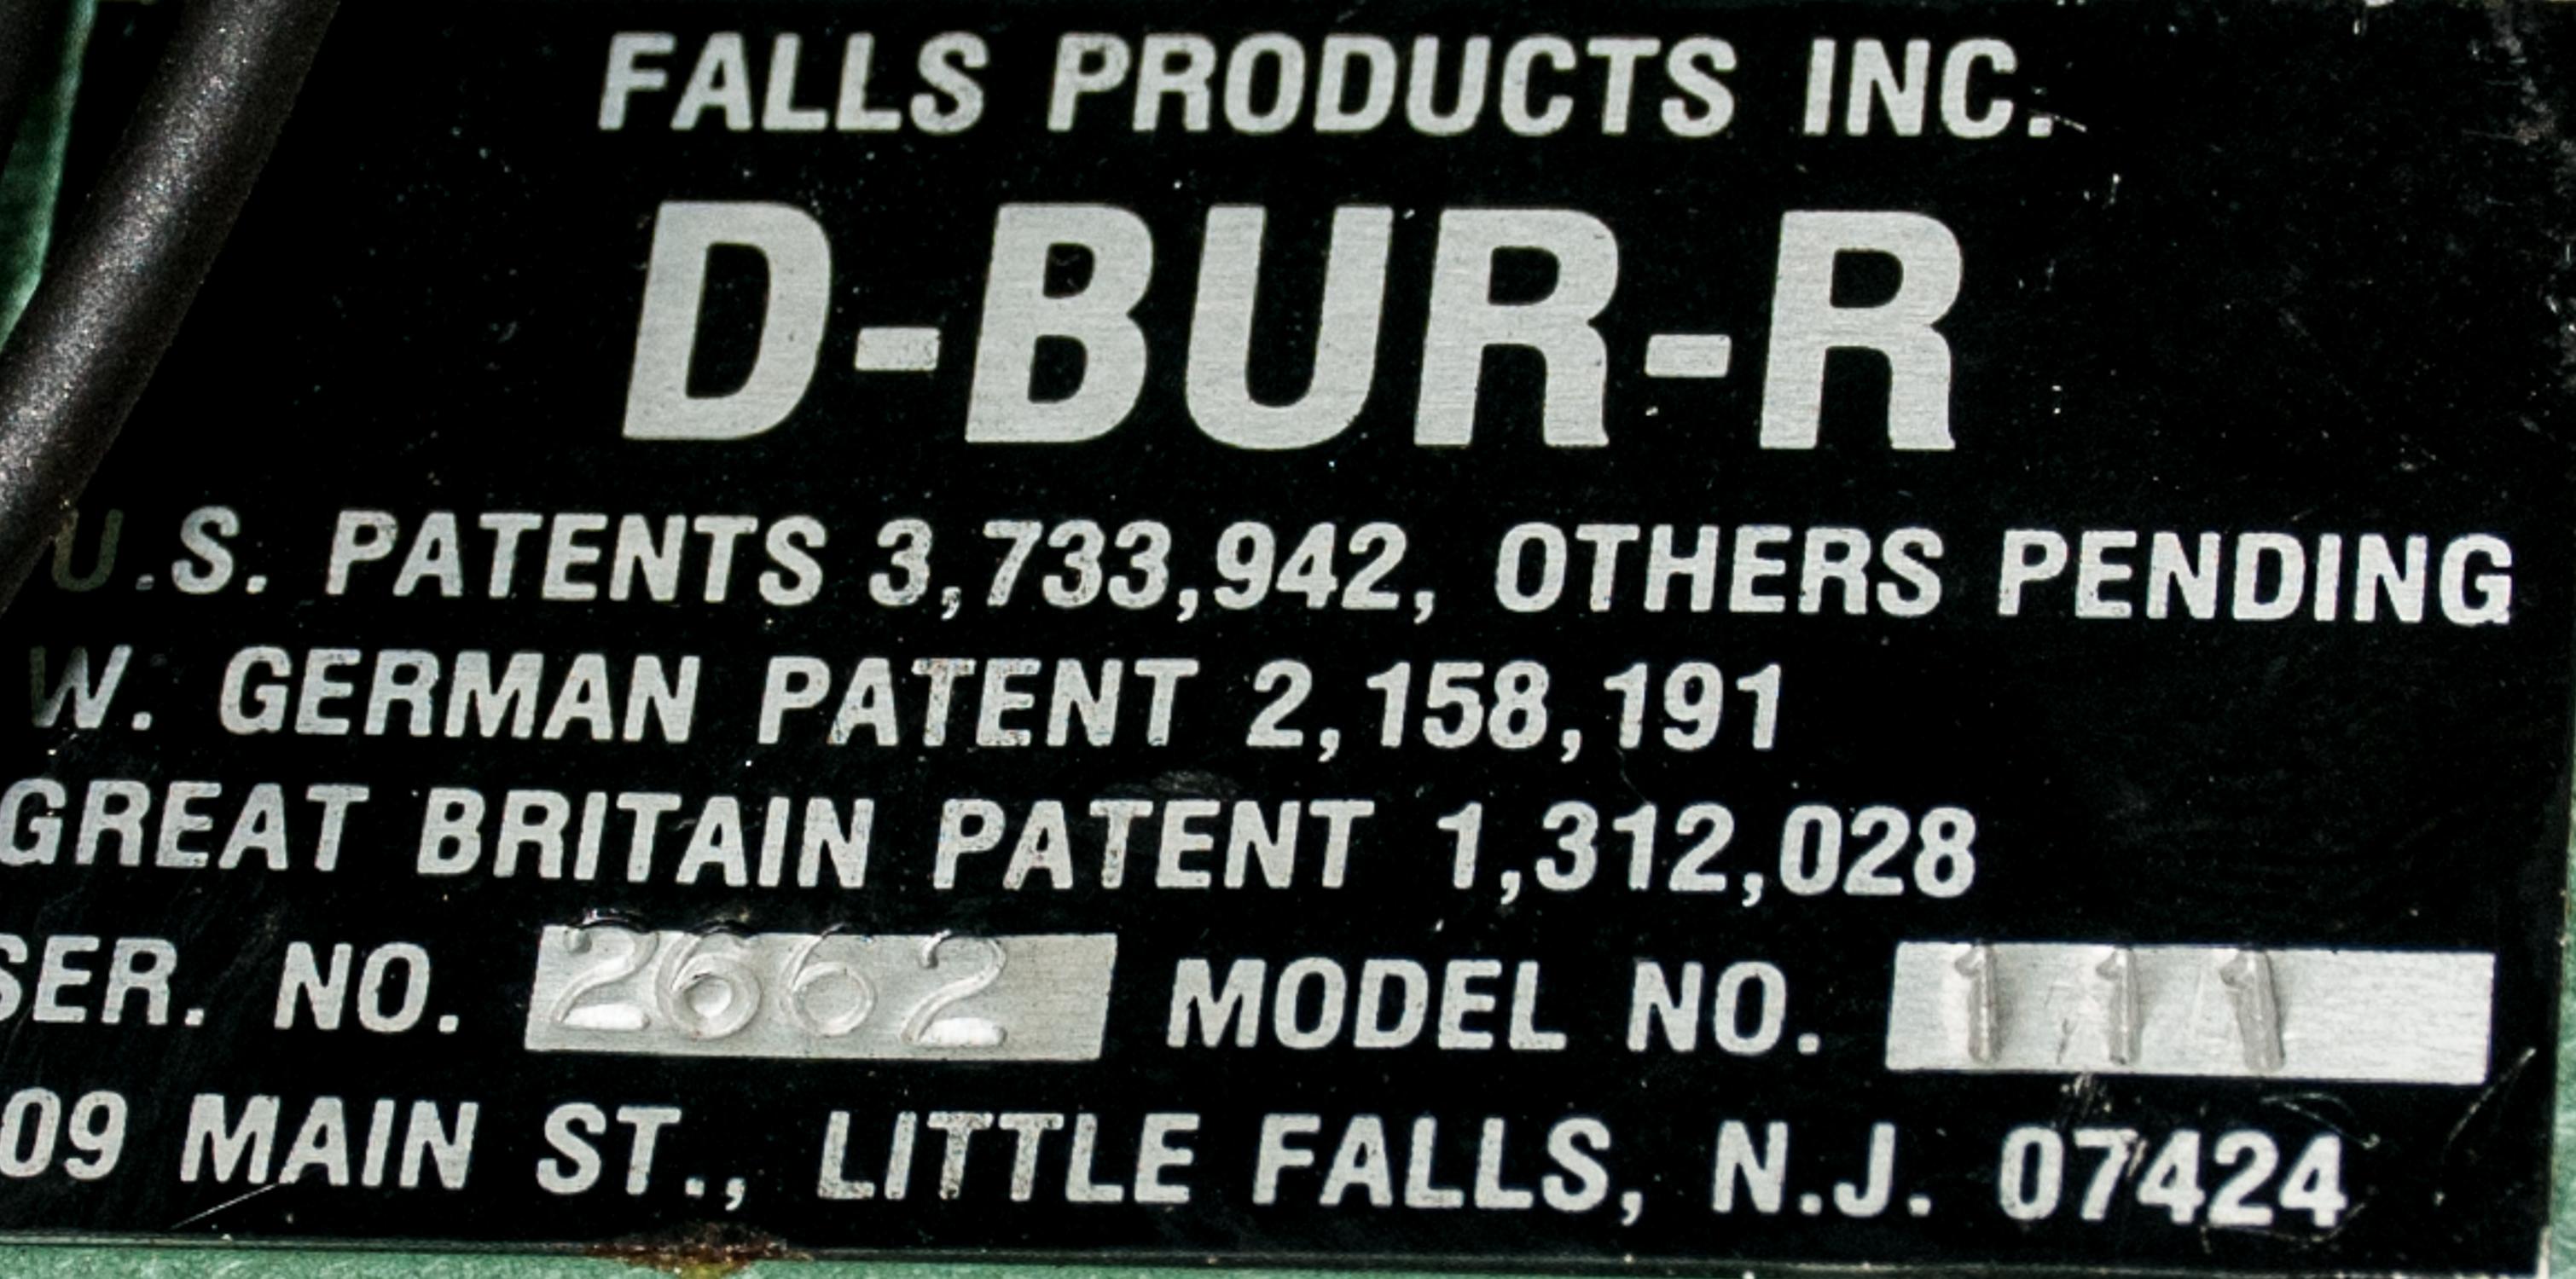 Falls Products D-BUR-R Mdl 111, s/n 2662, 110v Deburring Machine. - Image 2 of 2